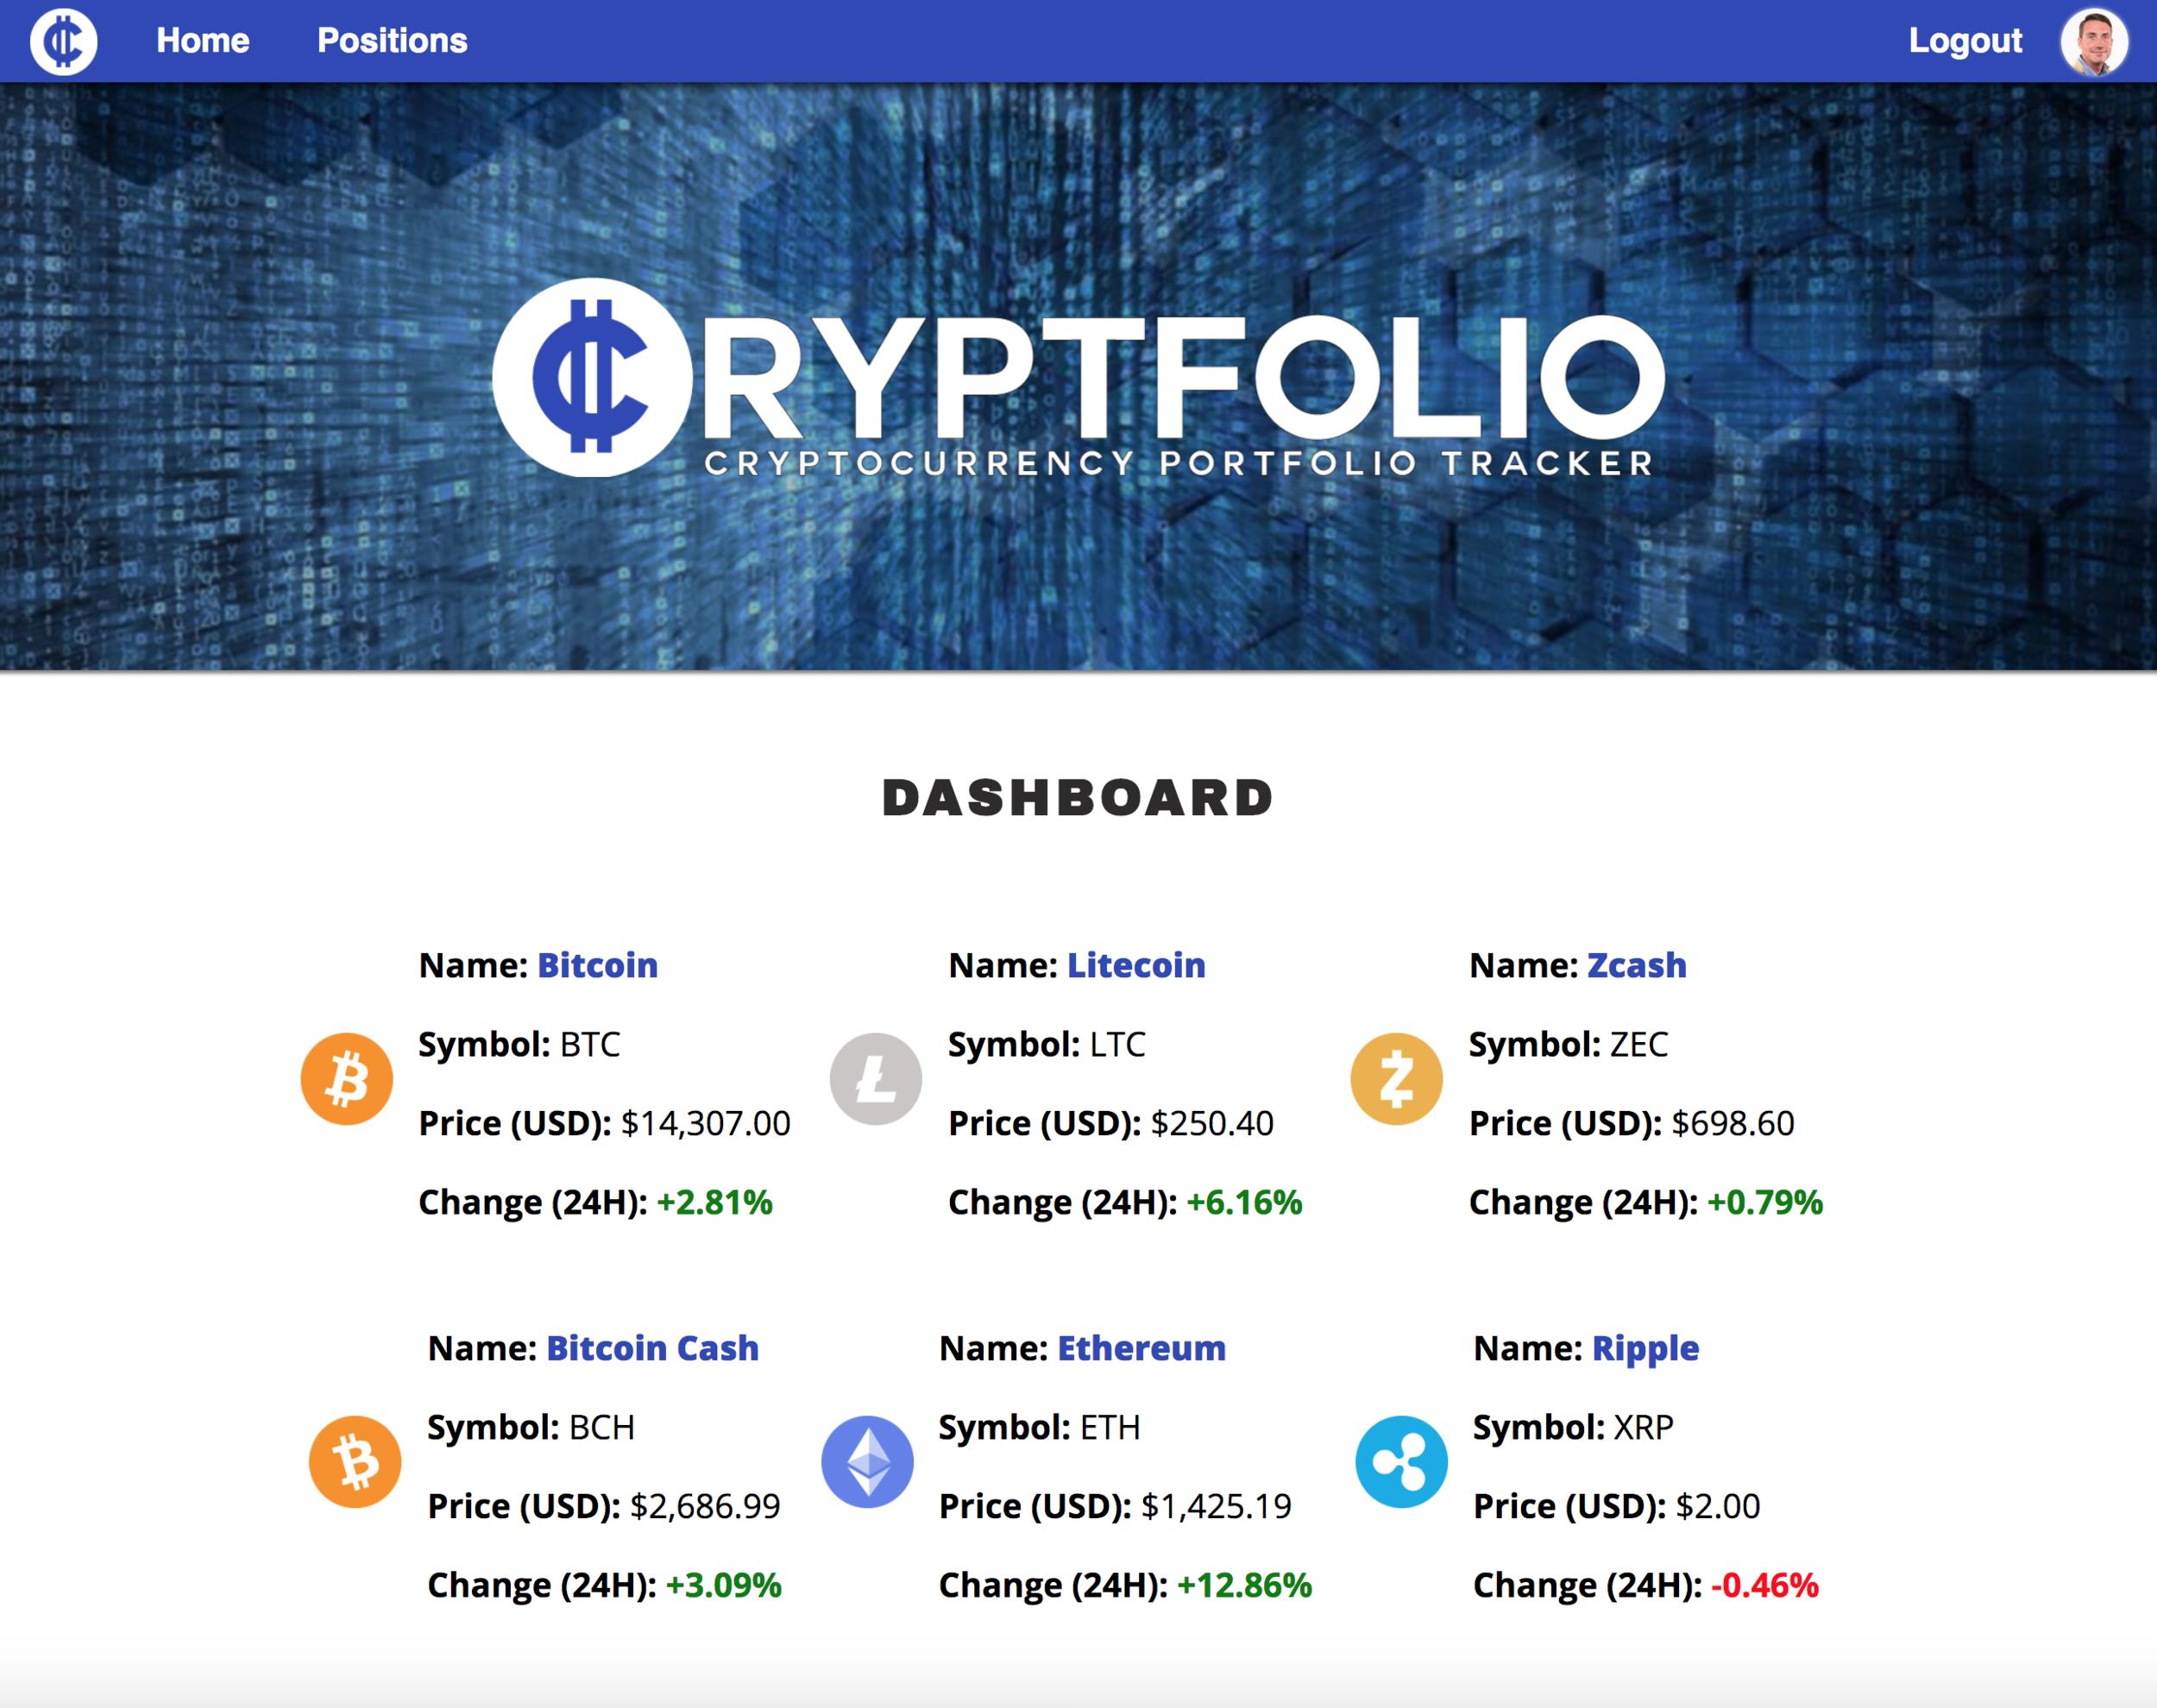 Cryptfolio Screenshot